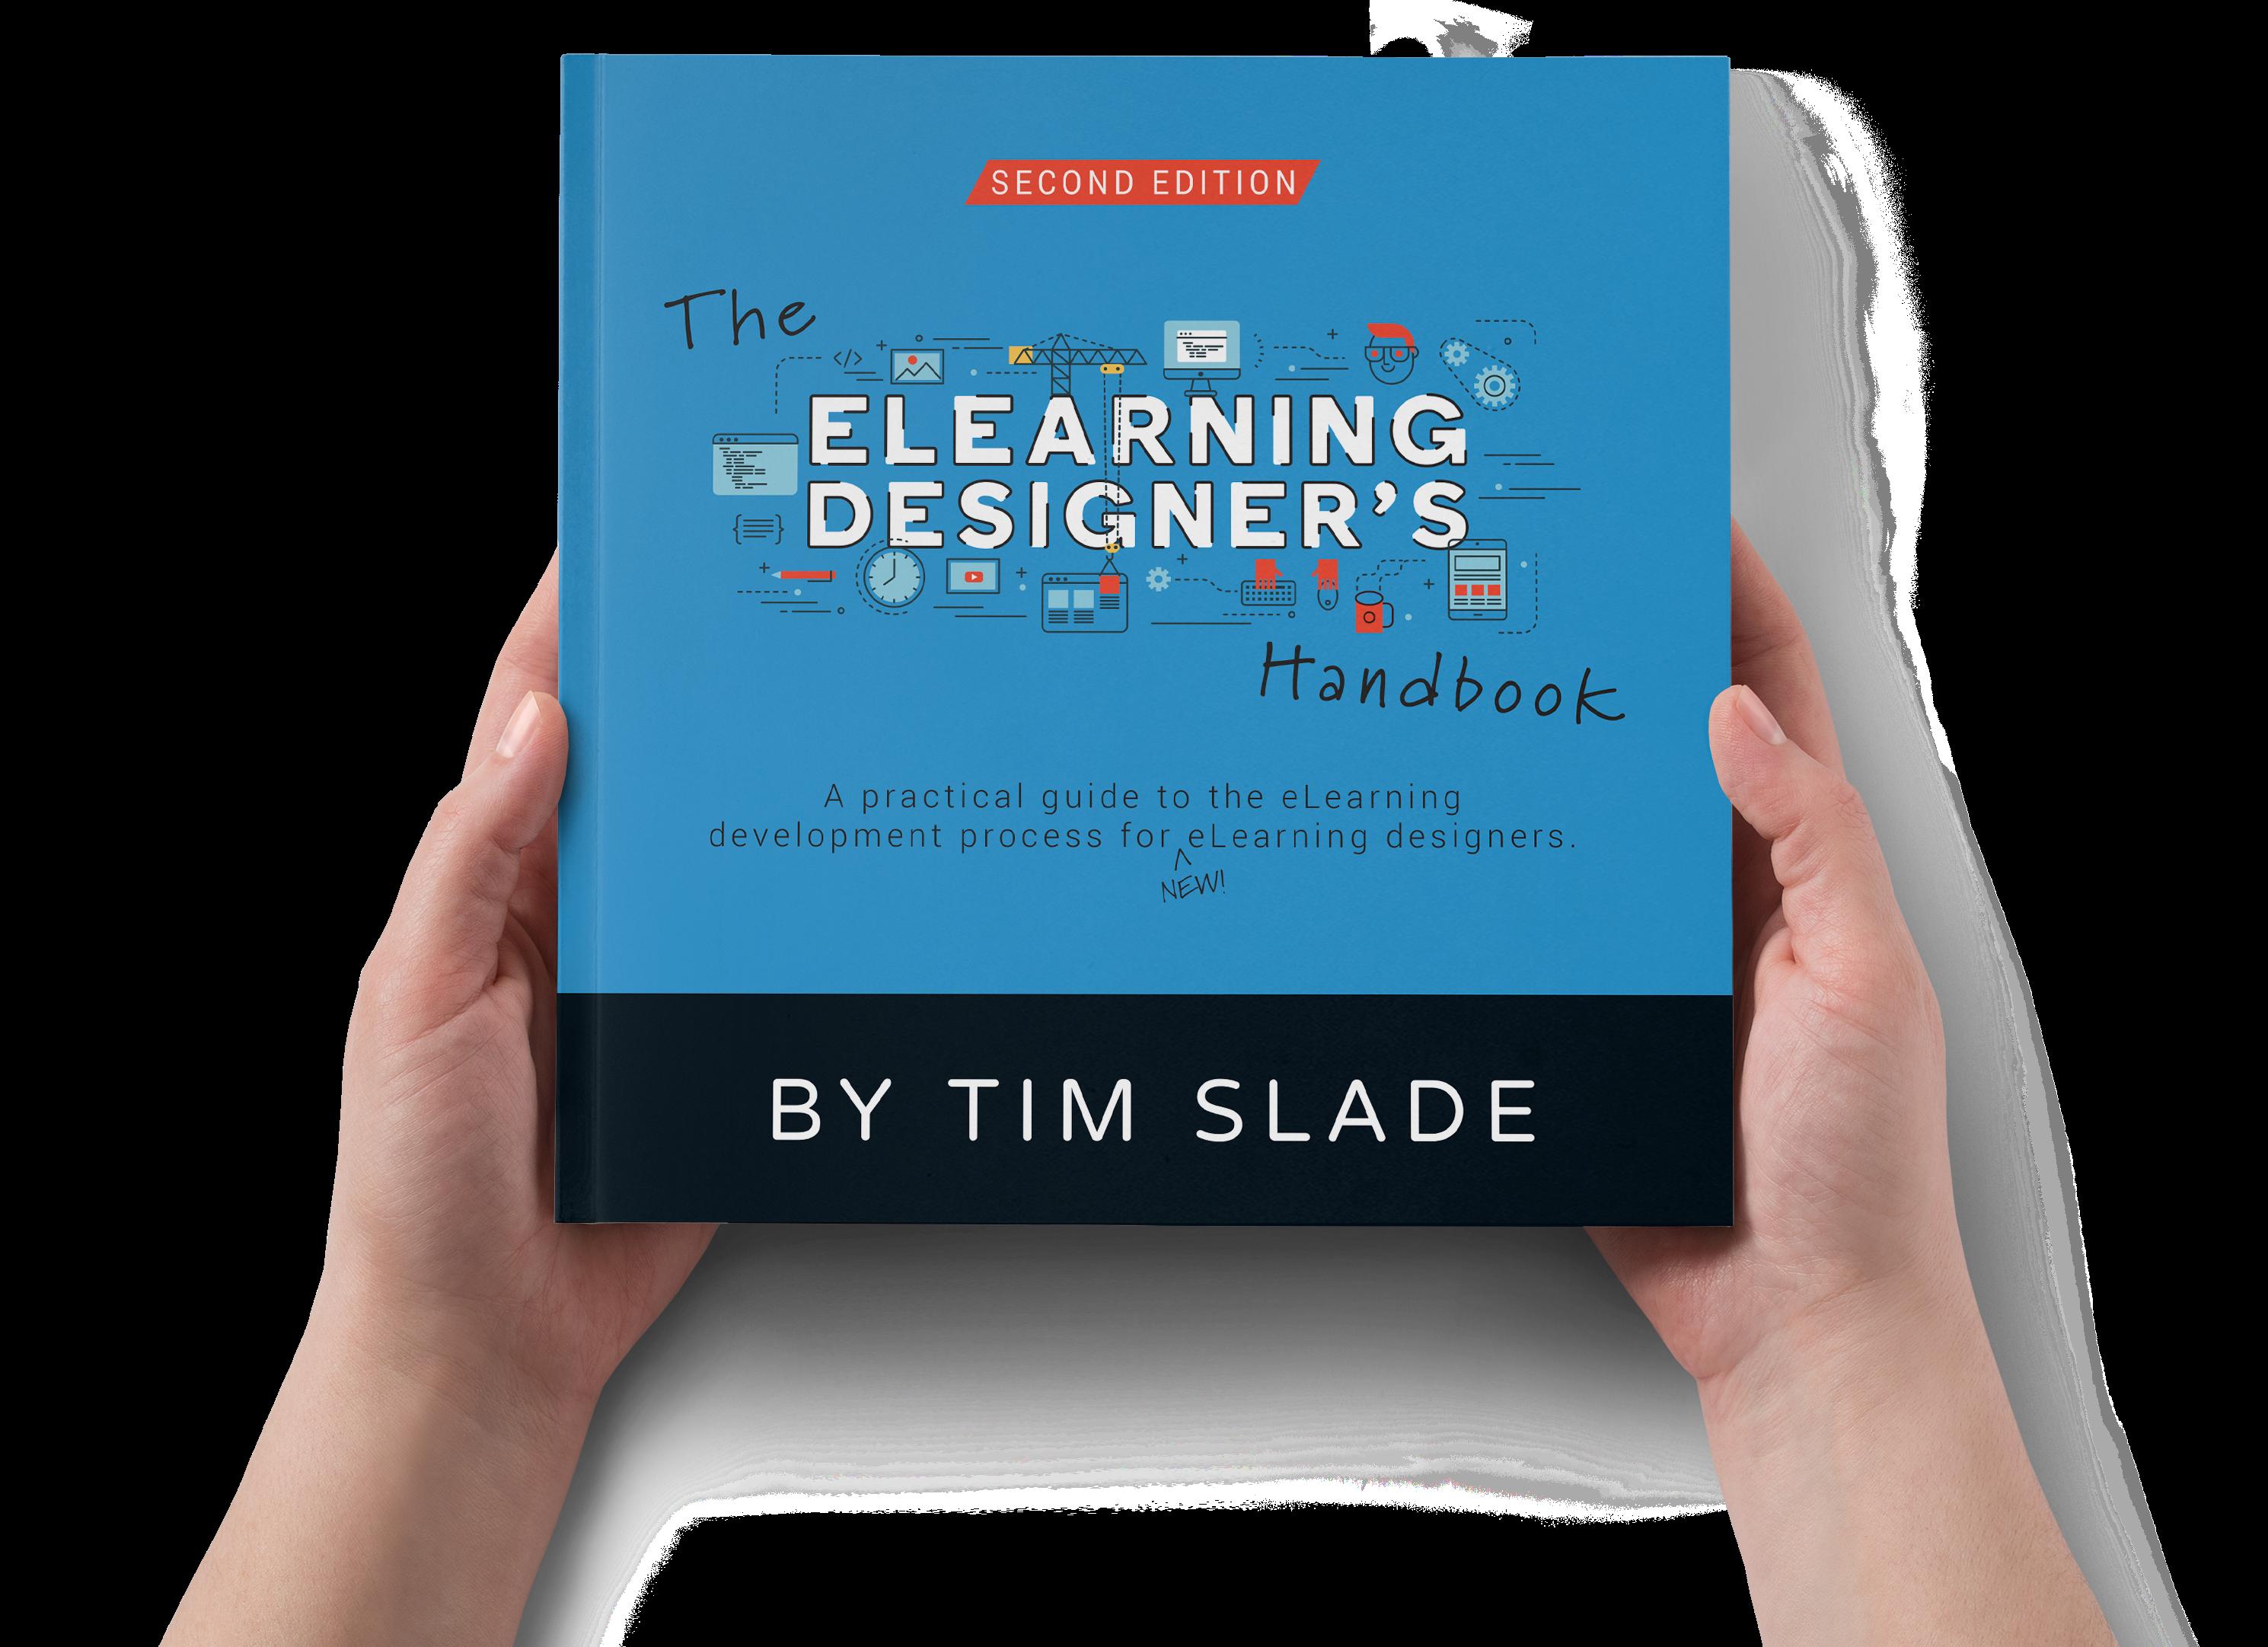 The eLearning Designer's Handbook by Tim Slade